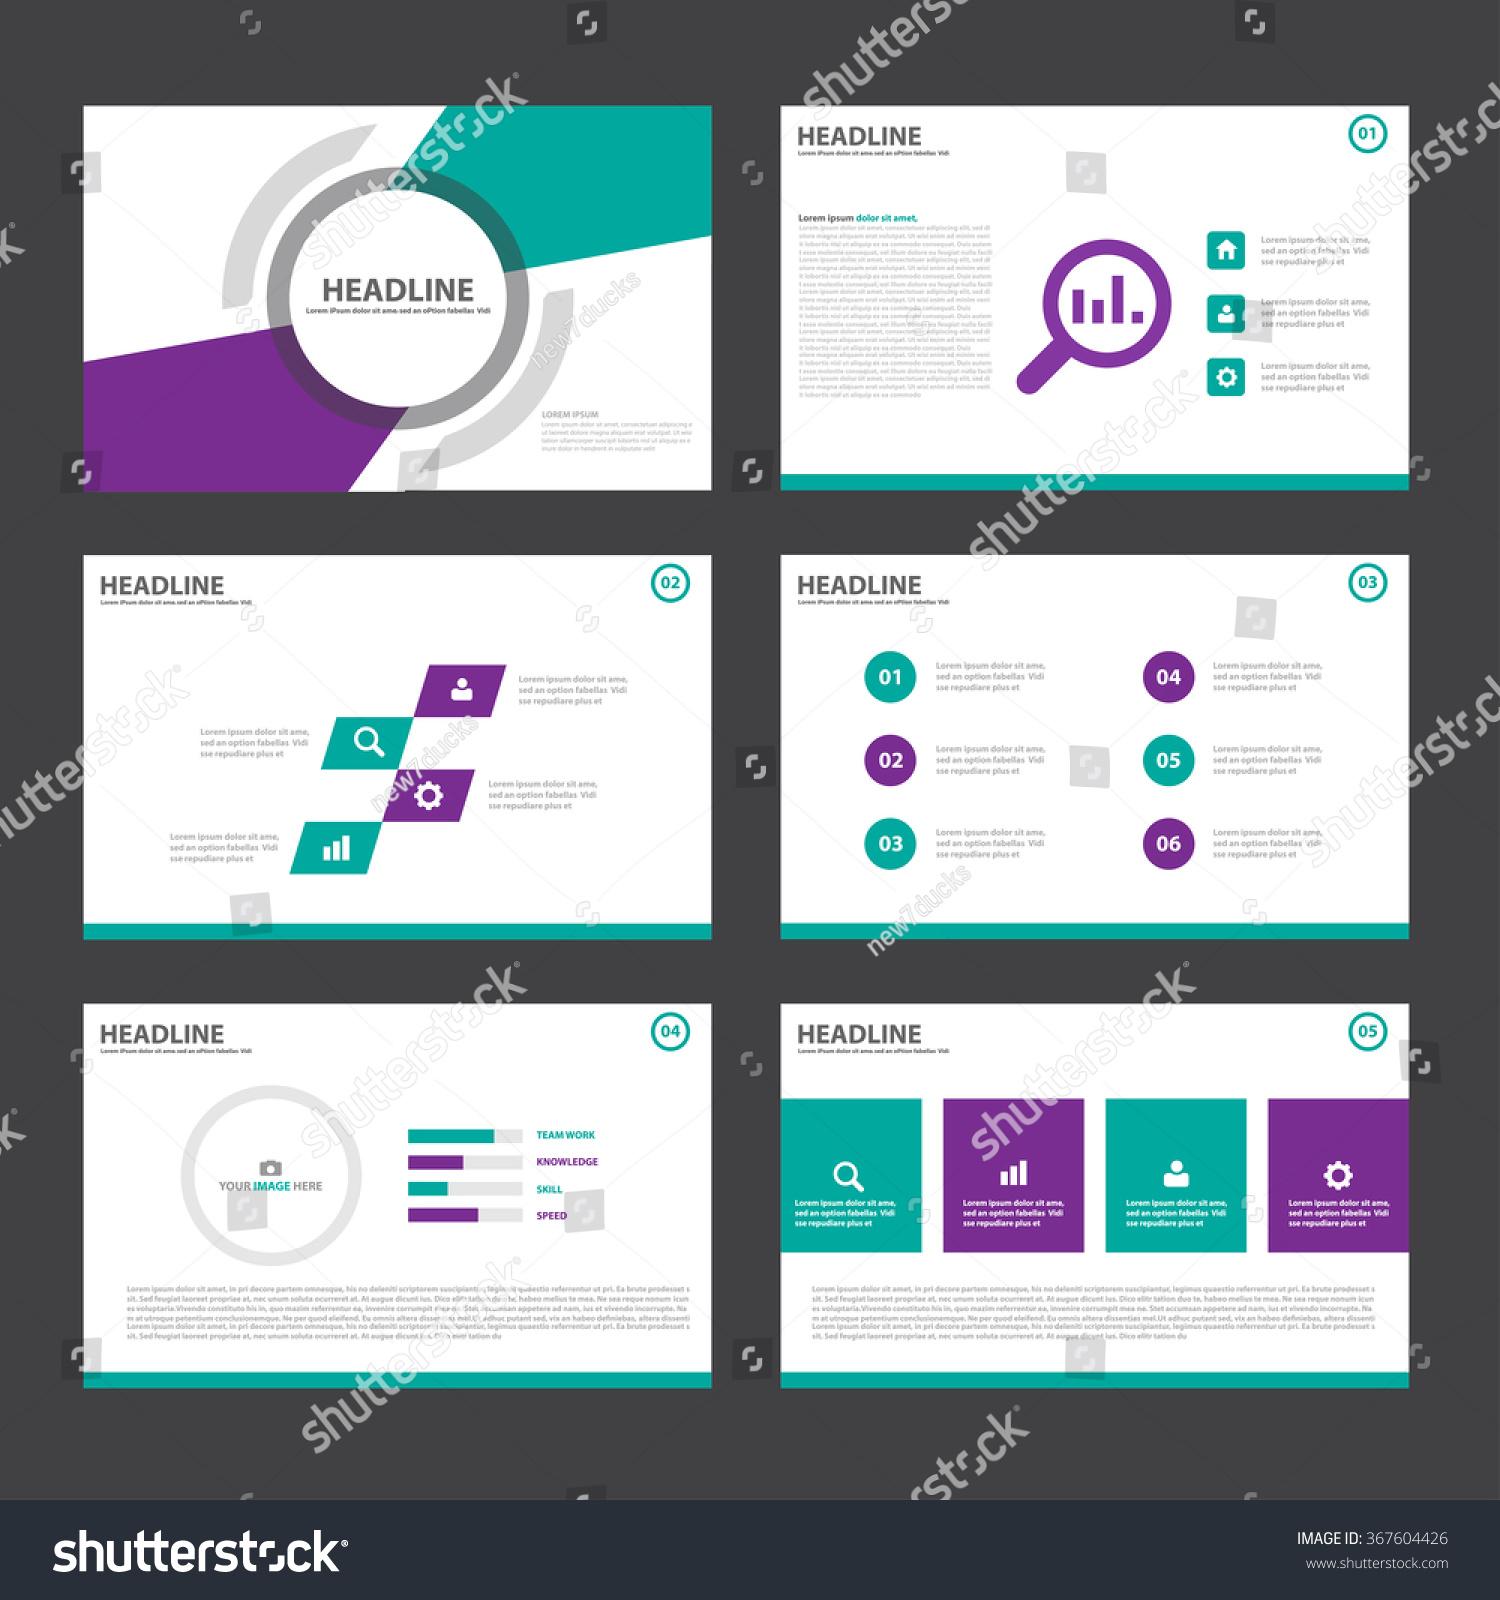 Green Purple Presentation Templates Infographic Elements Stock ...